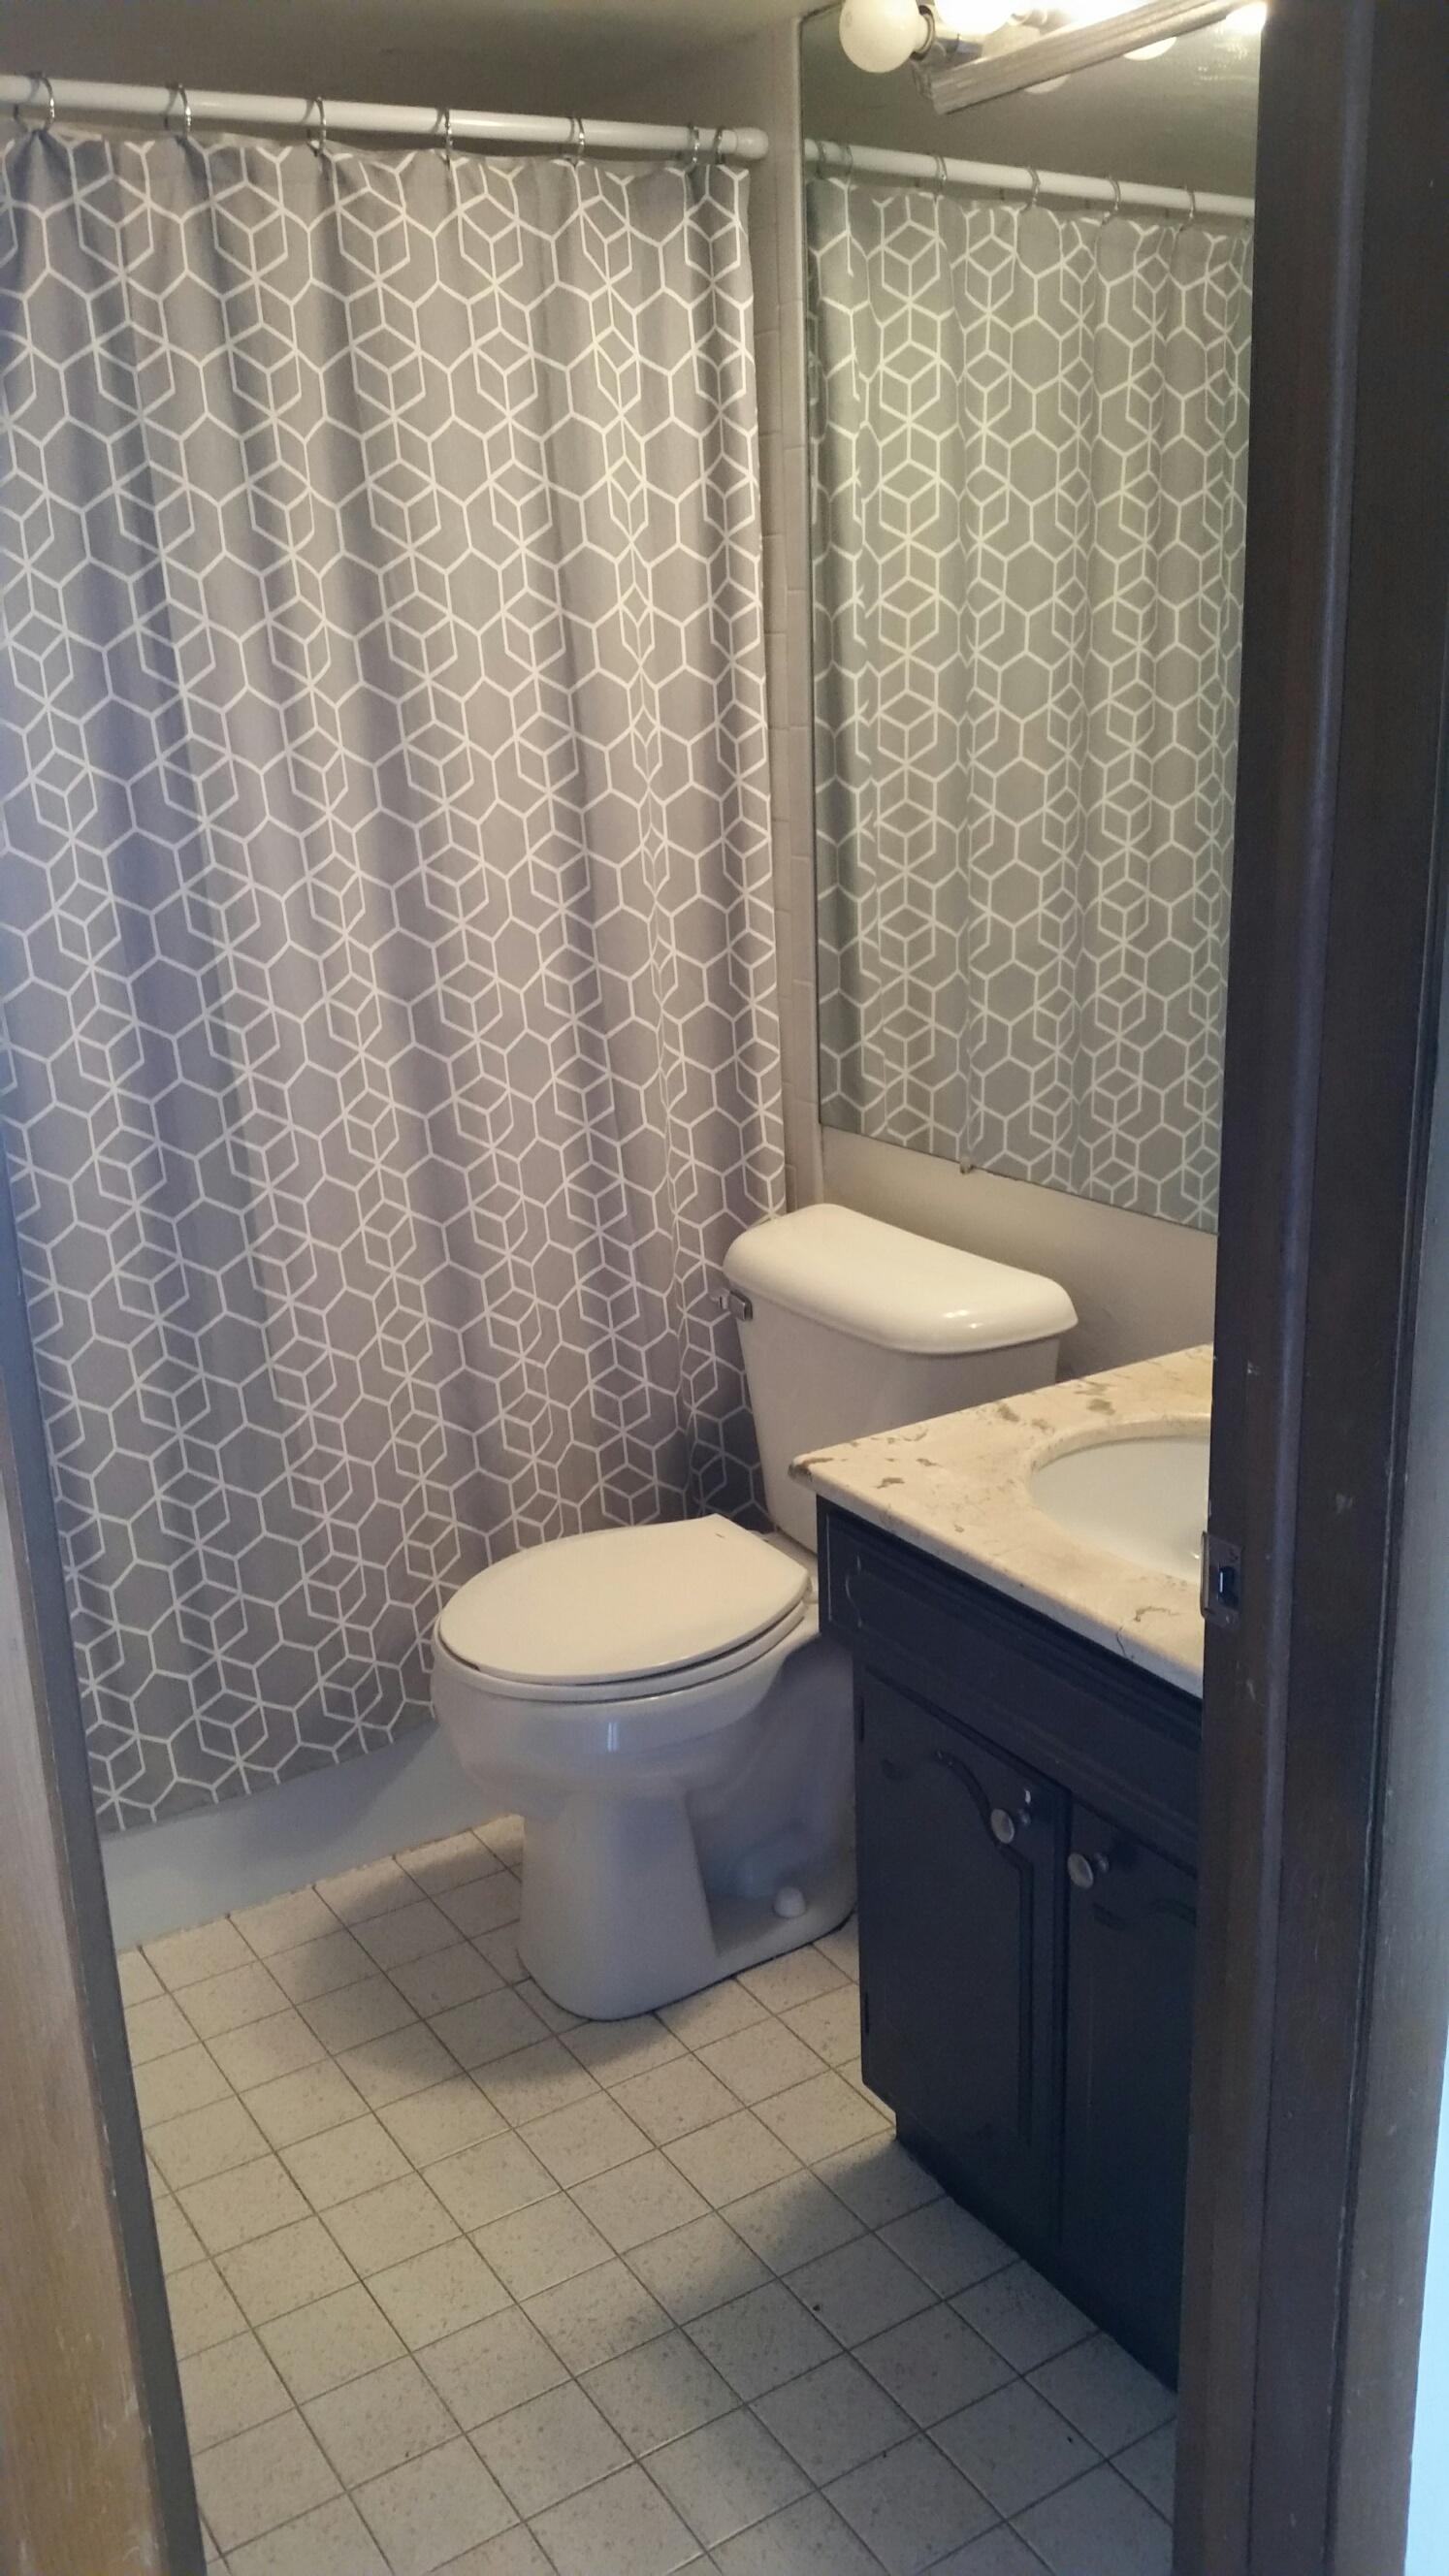 3939-606 bathroom 1.jpg